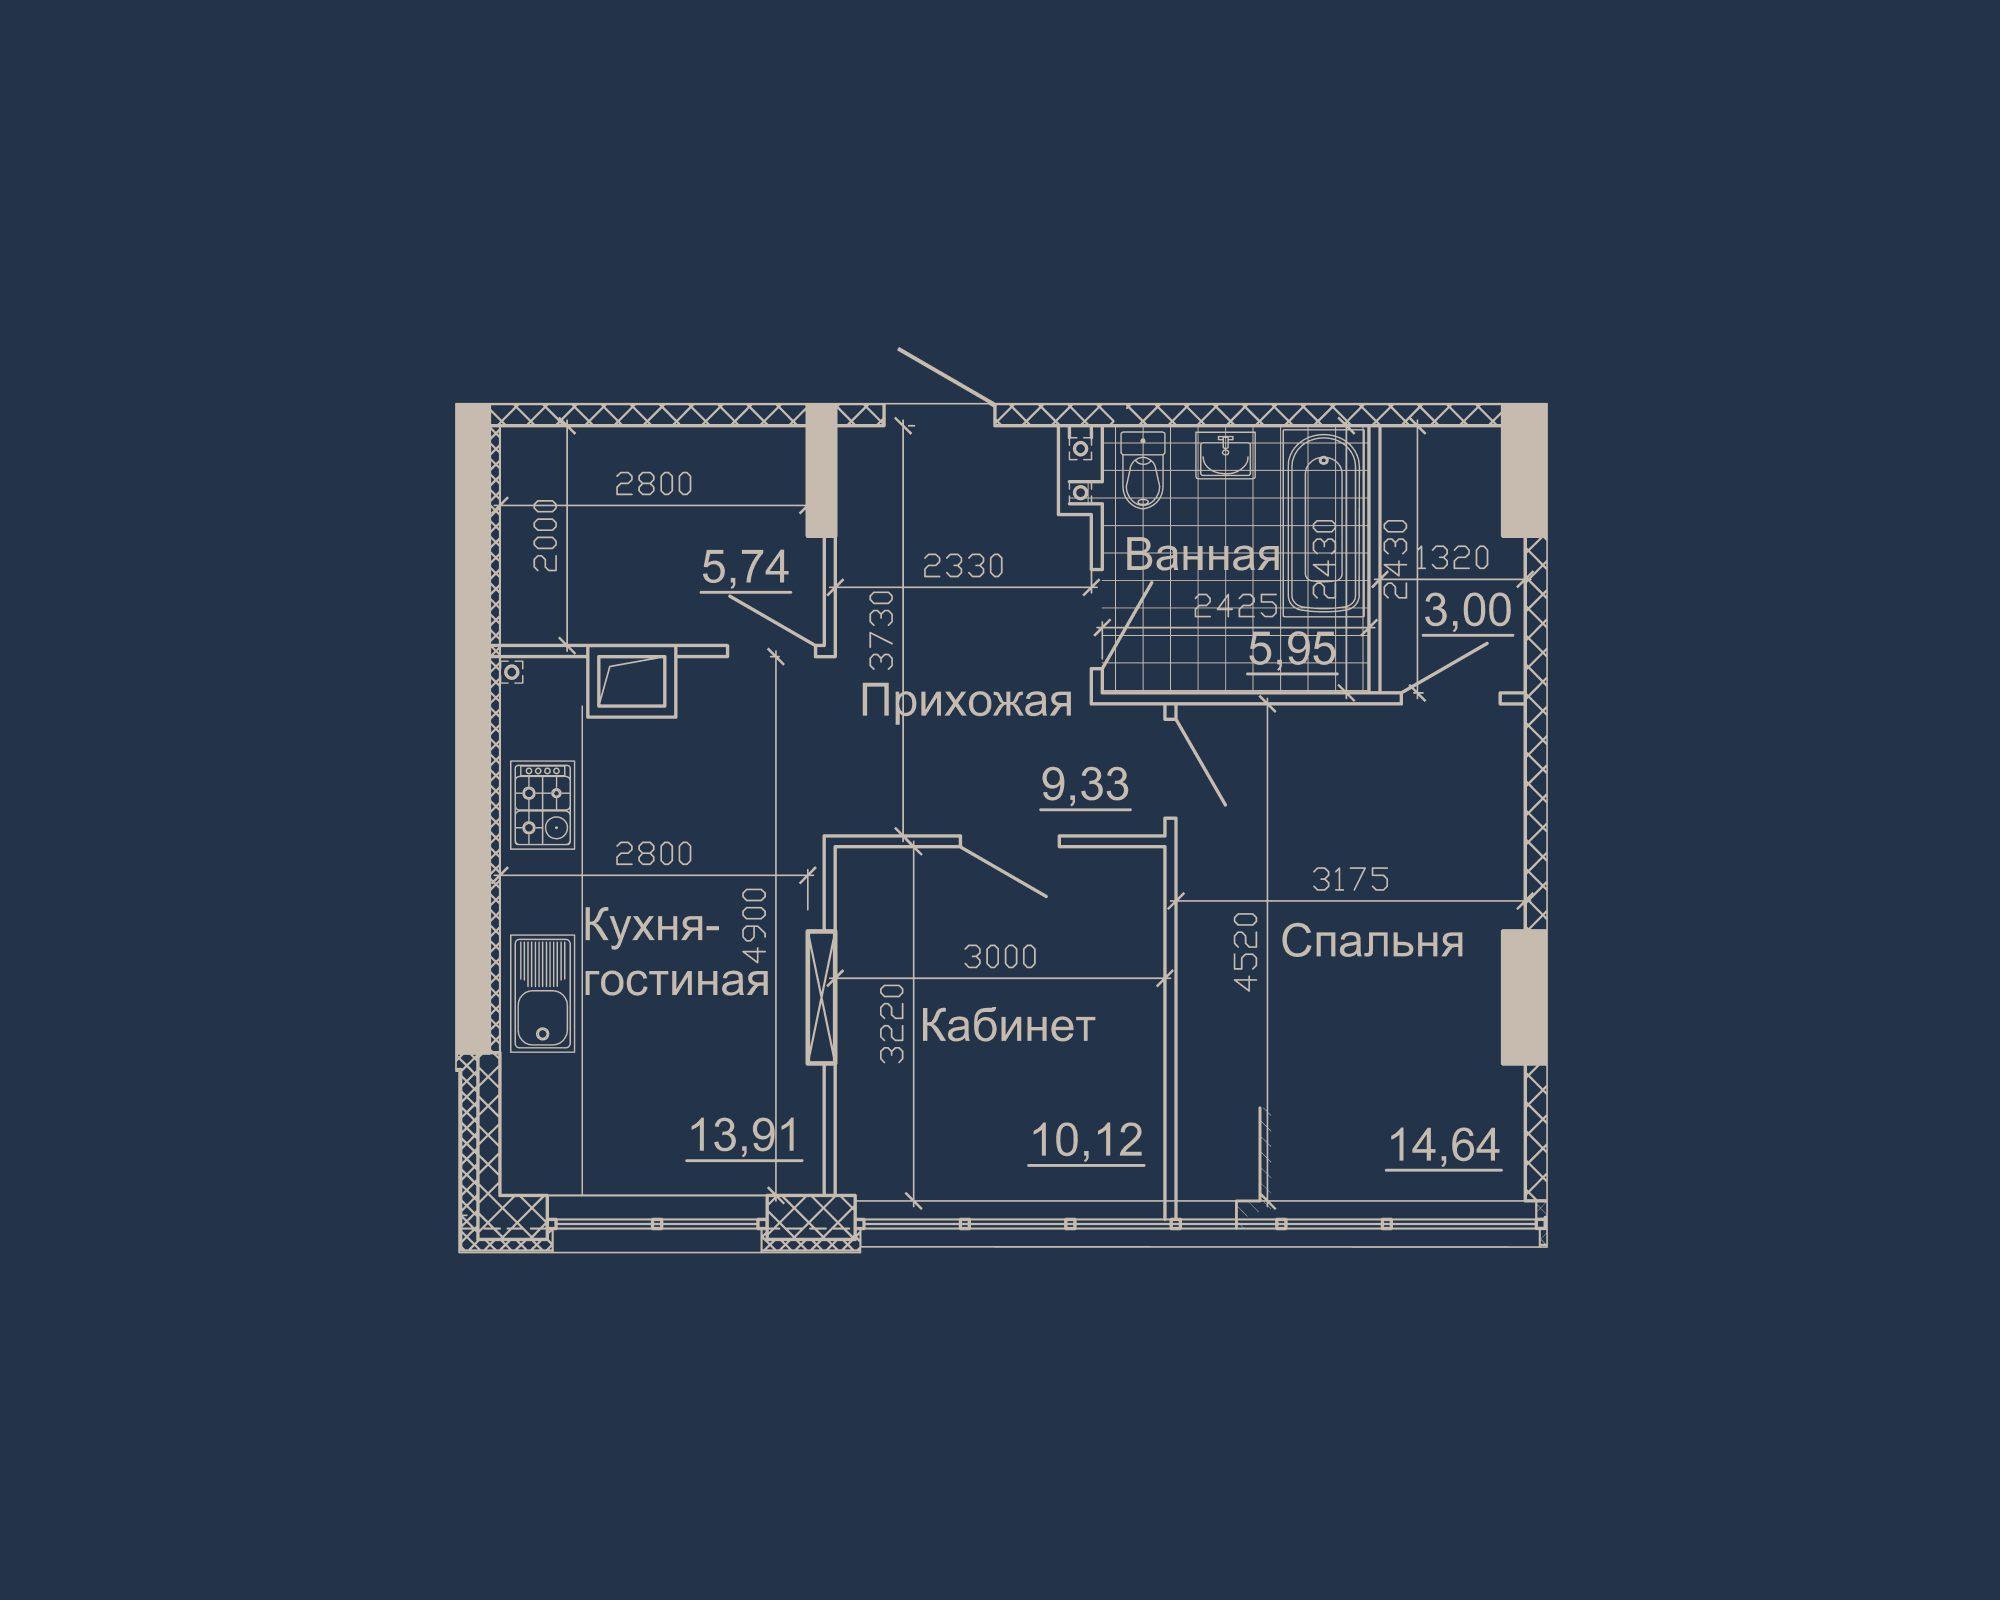 2-кімнатна квартира типу 09А у ЖК Nebo